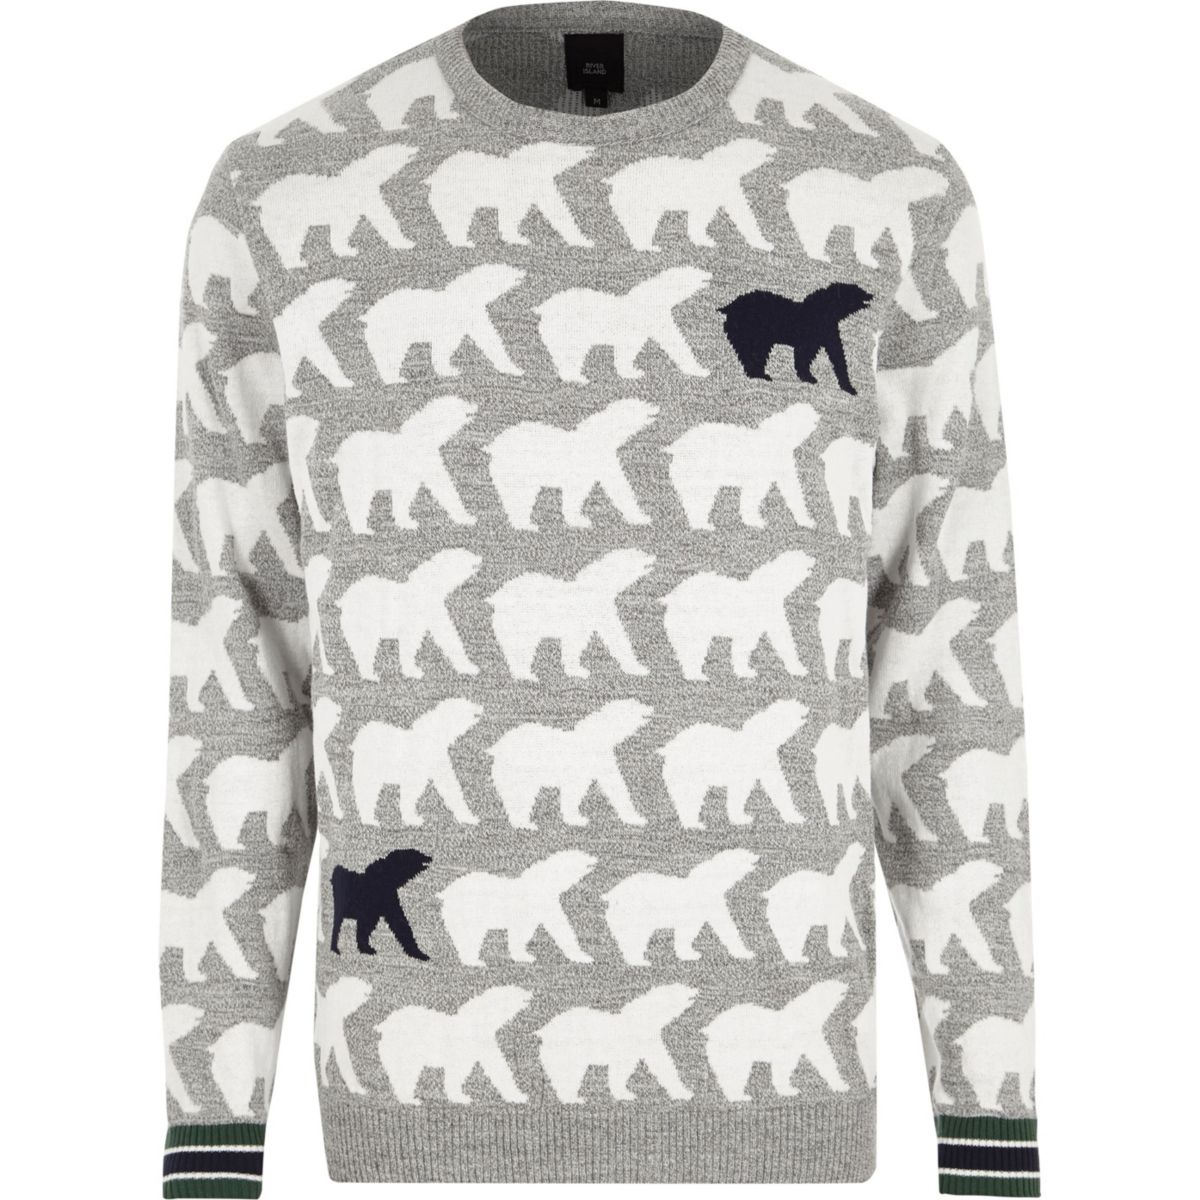 Grey polar bear knit Christmas jumper